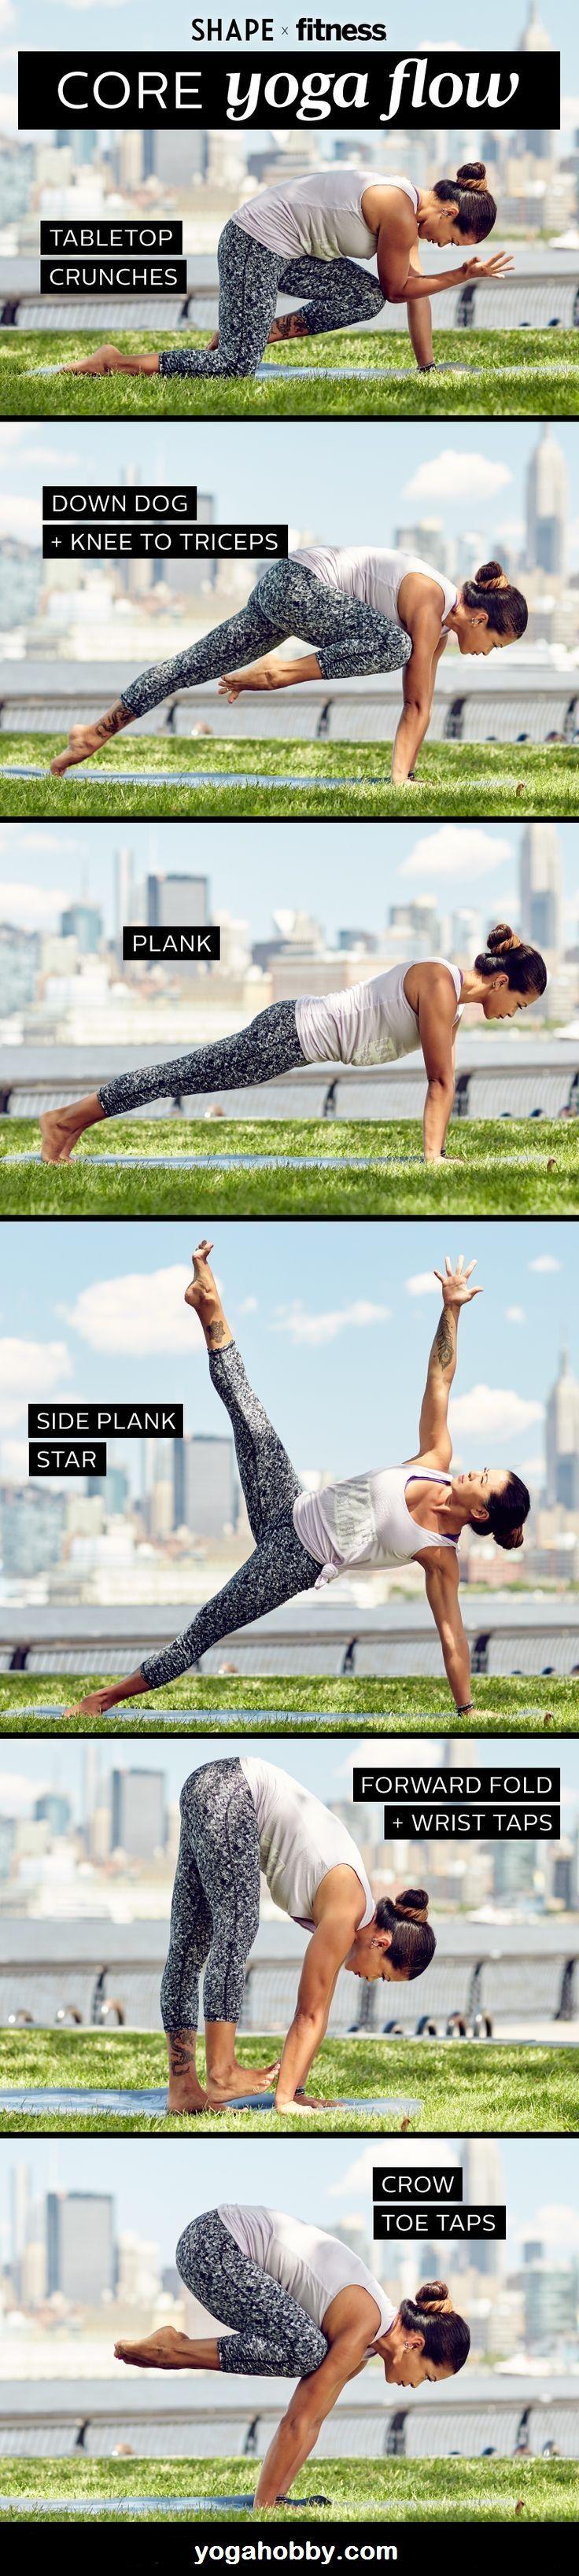 core yoga flow http://yogahobby.com/  #yoga #hatha_yoga #yoga_poses #yoga_for_beginners